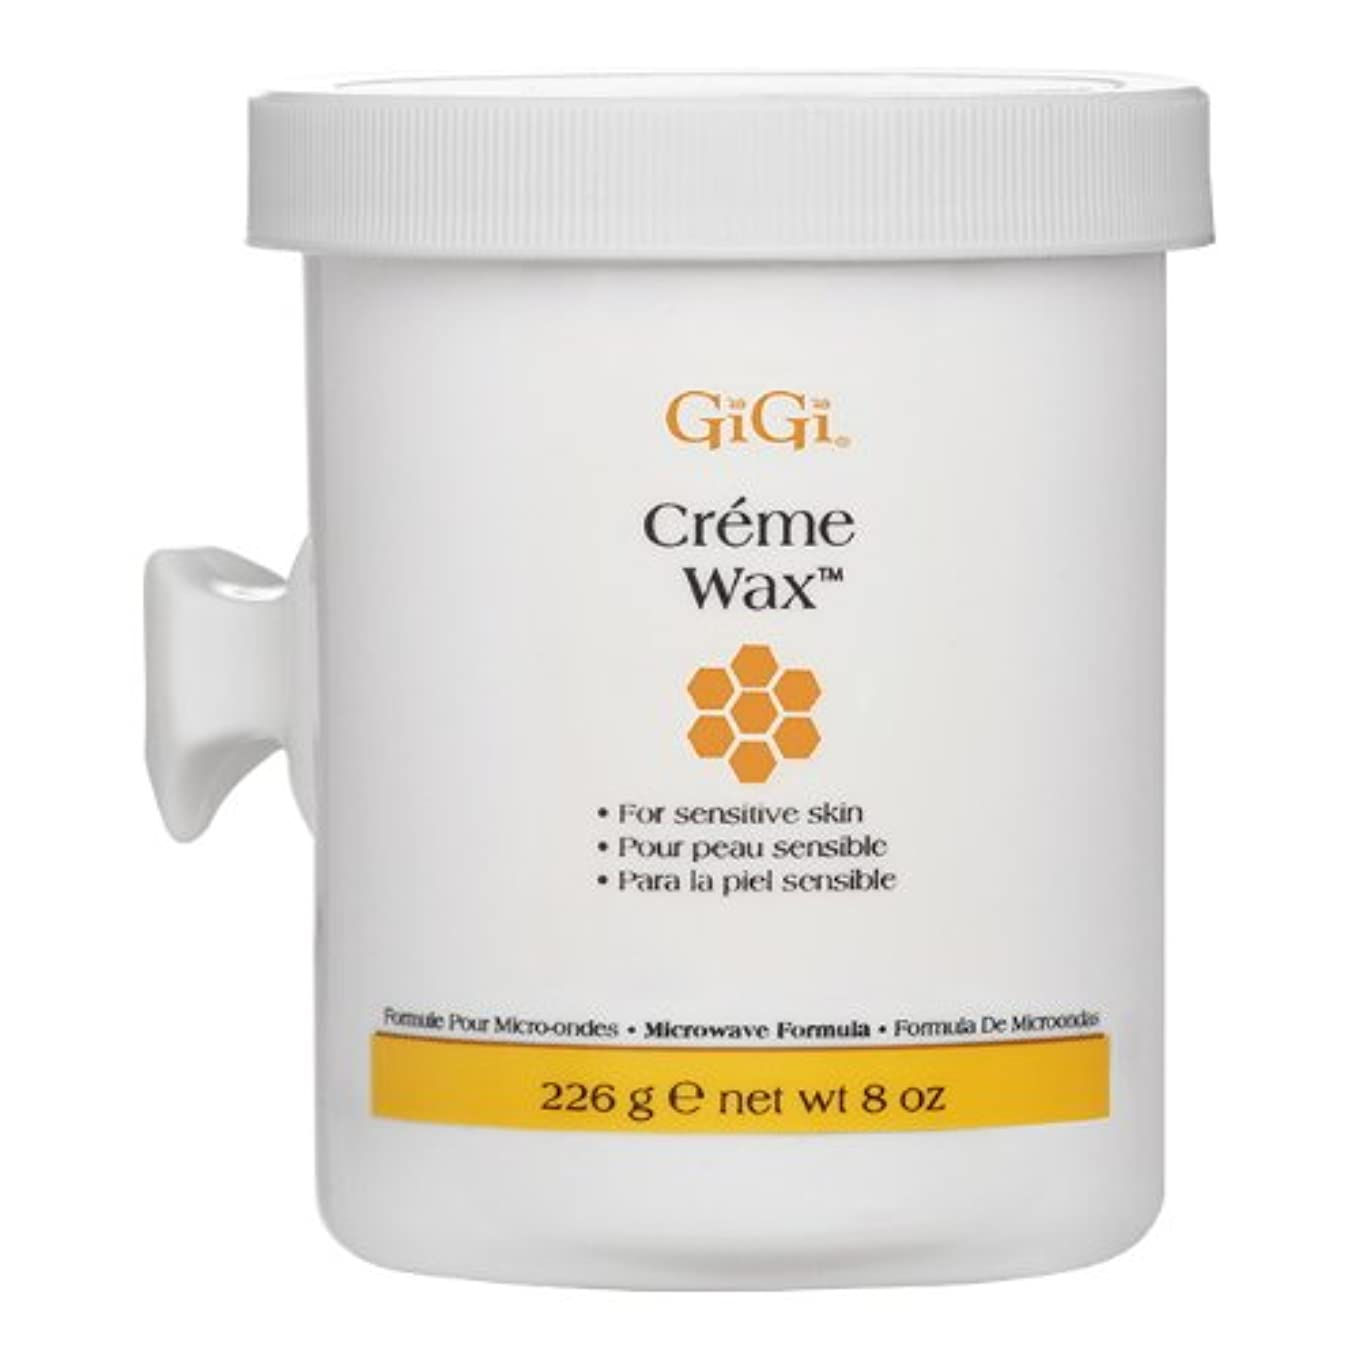 ルビー贅沢有名(3 Pack) GIGI Creme Wax Microwave - GG0360 (並行輸入品)